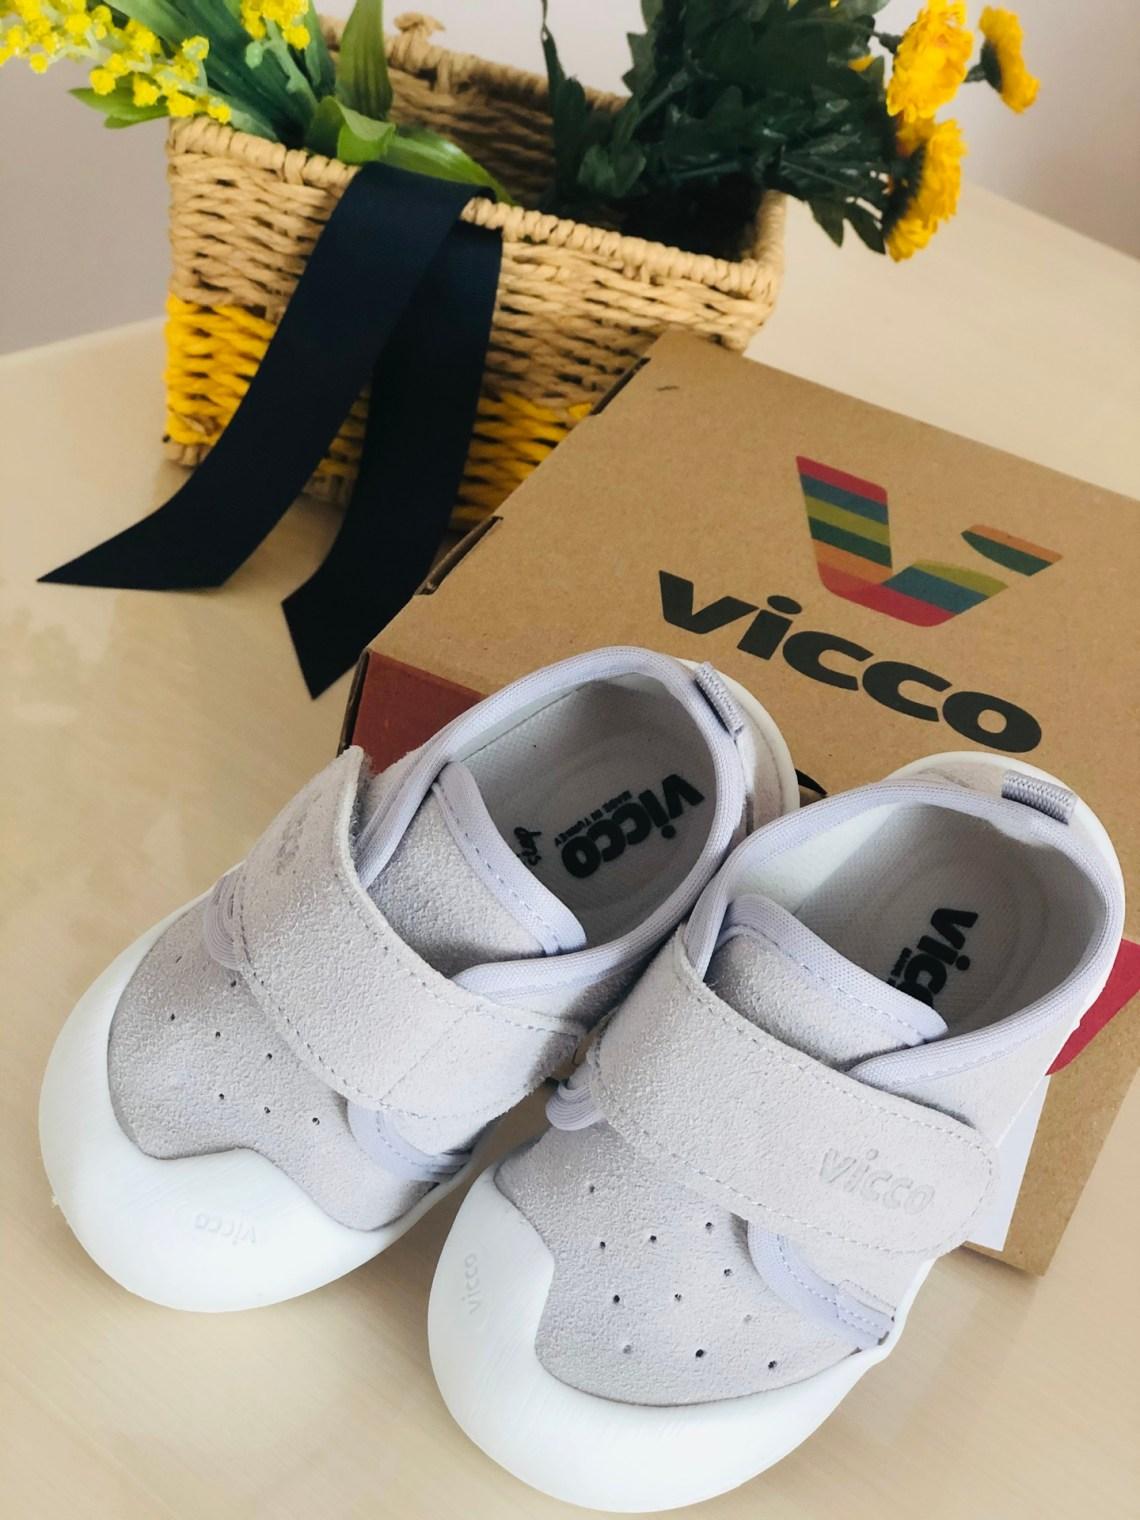 vicco-ilk-adim-ayakkabisi